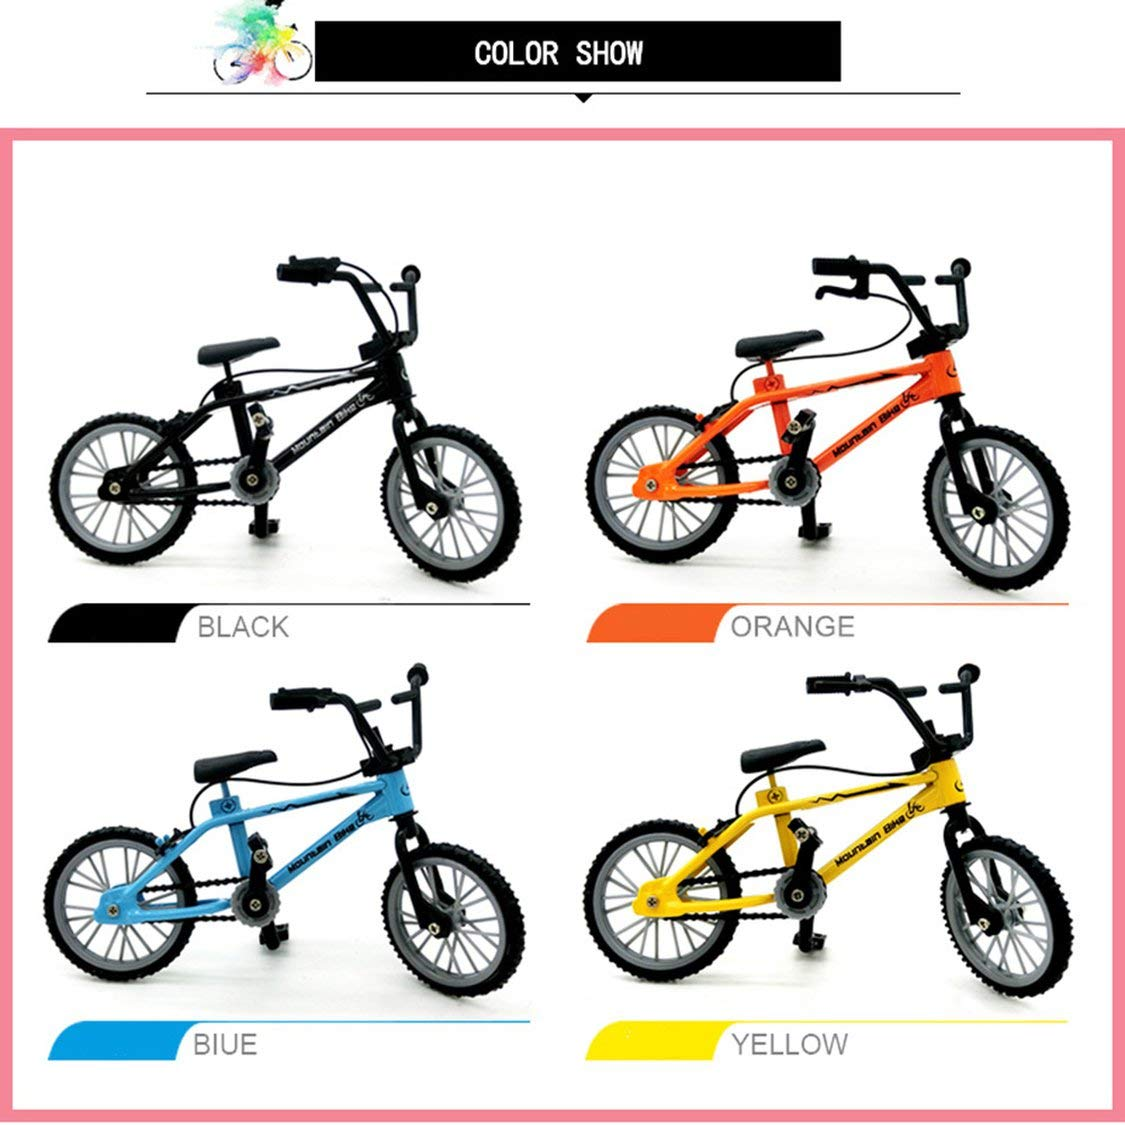 Gwendoll Mini-Dedo-BMX Set Fans de Bicicleta Juguete Aleaci/ón Dedo BMX Funcional Kids Bicicleta modle Dedo Bicicleta BMX Juguetes Regalo Amarillo